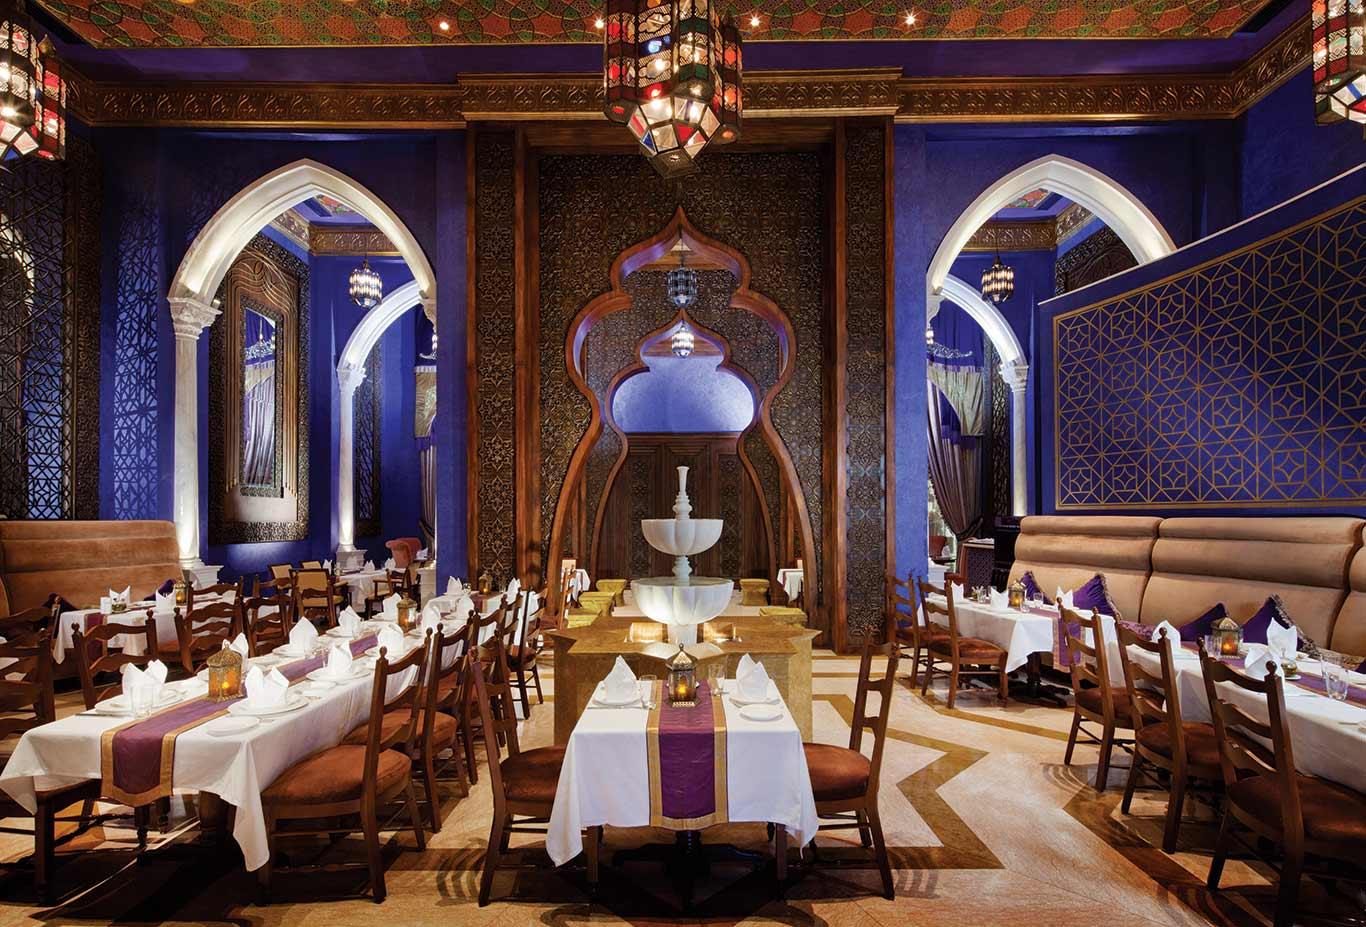 Al Nafoorah Restaurant - Jumeirah Zabeel Saray